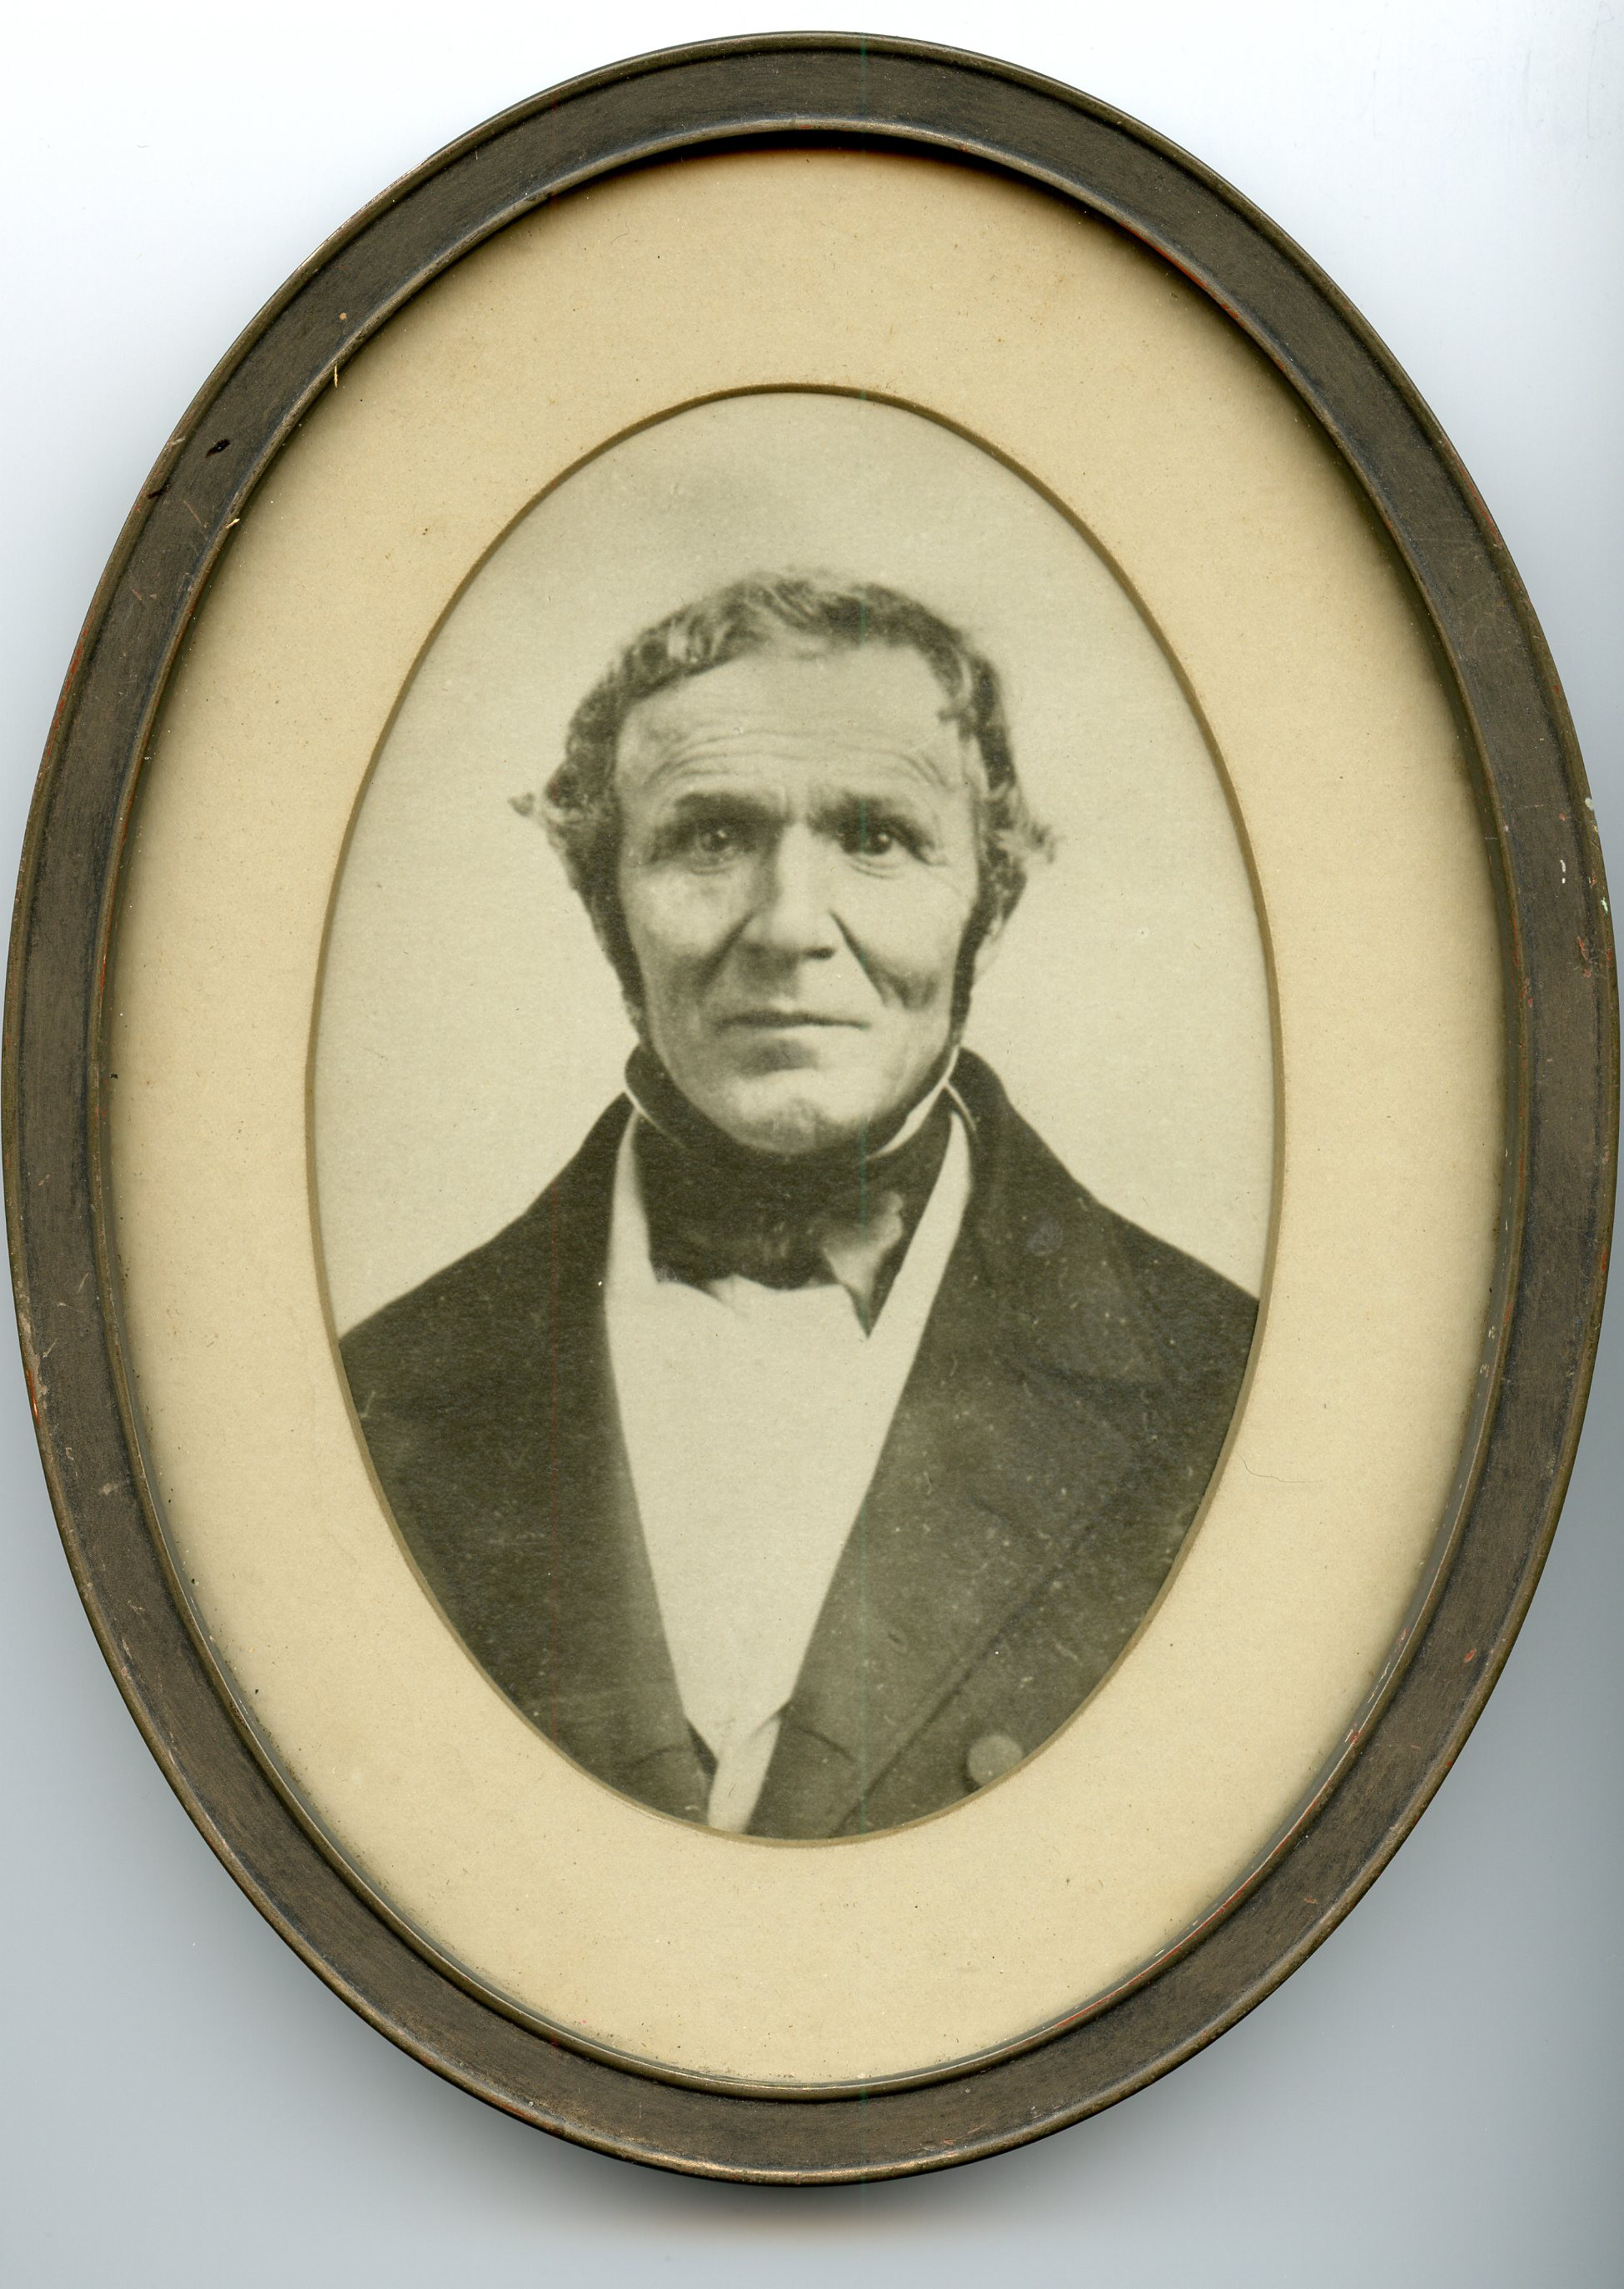 Joseph Eidson